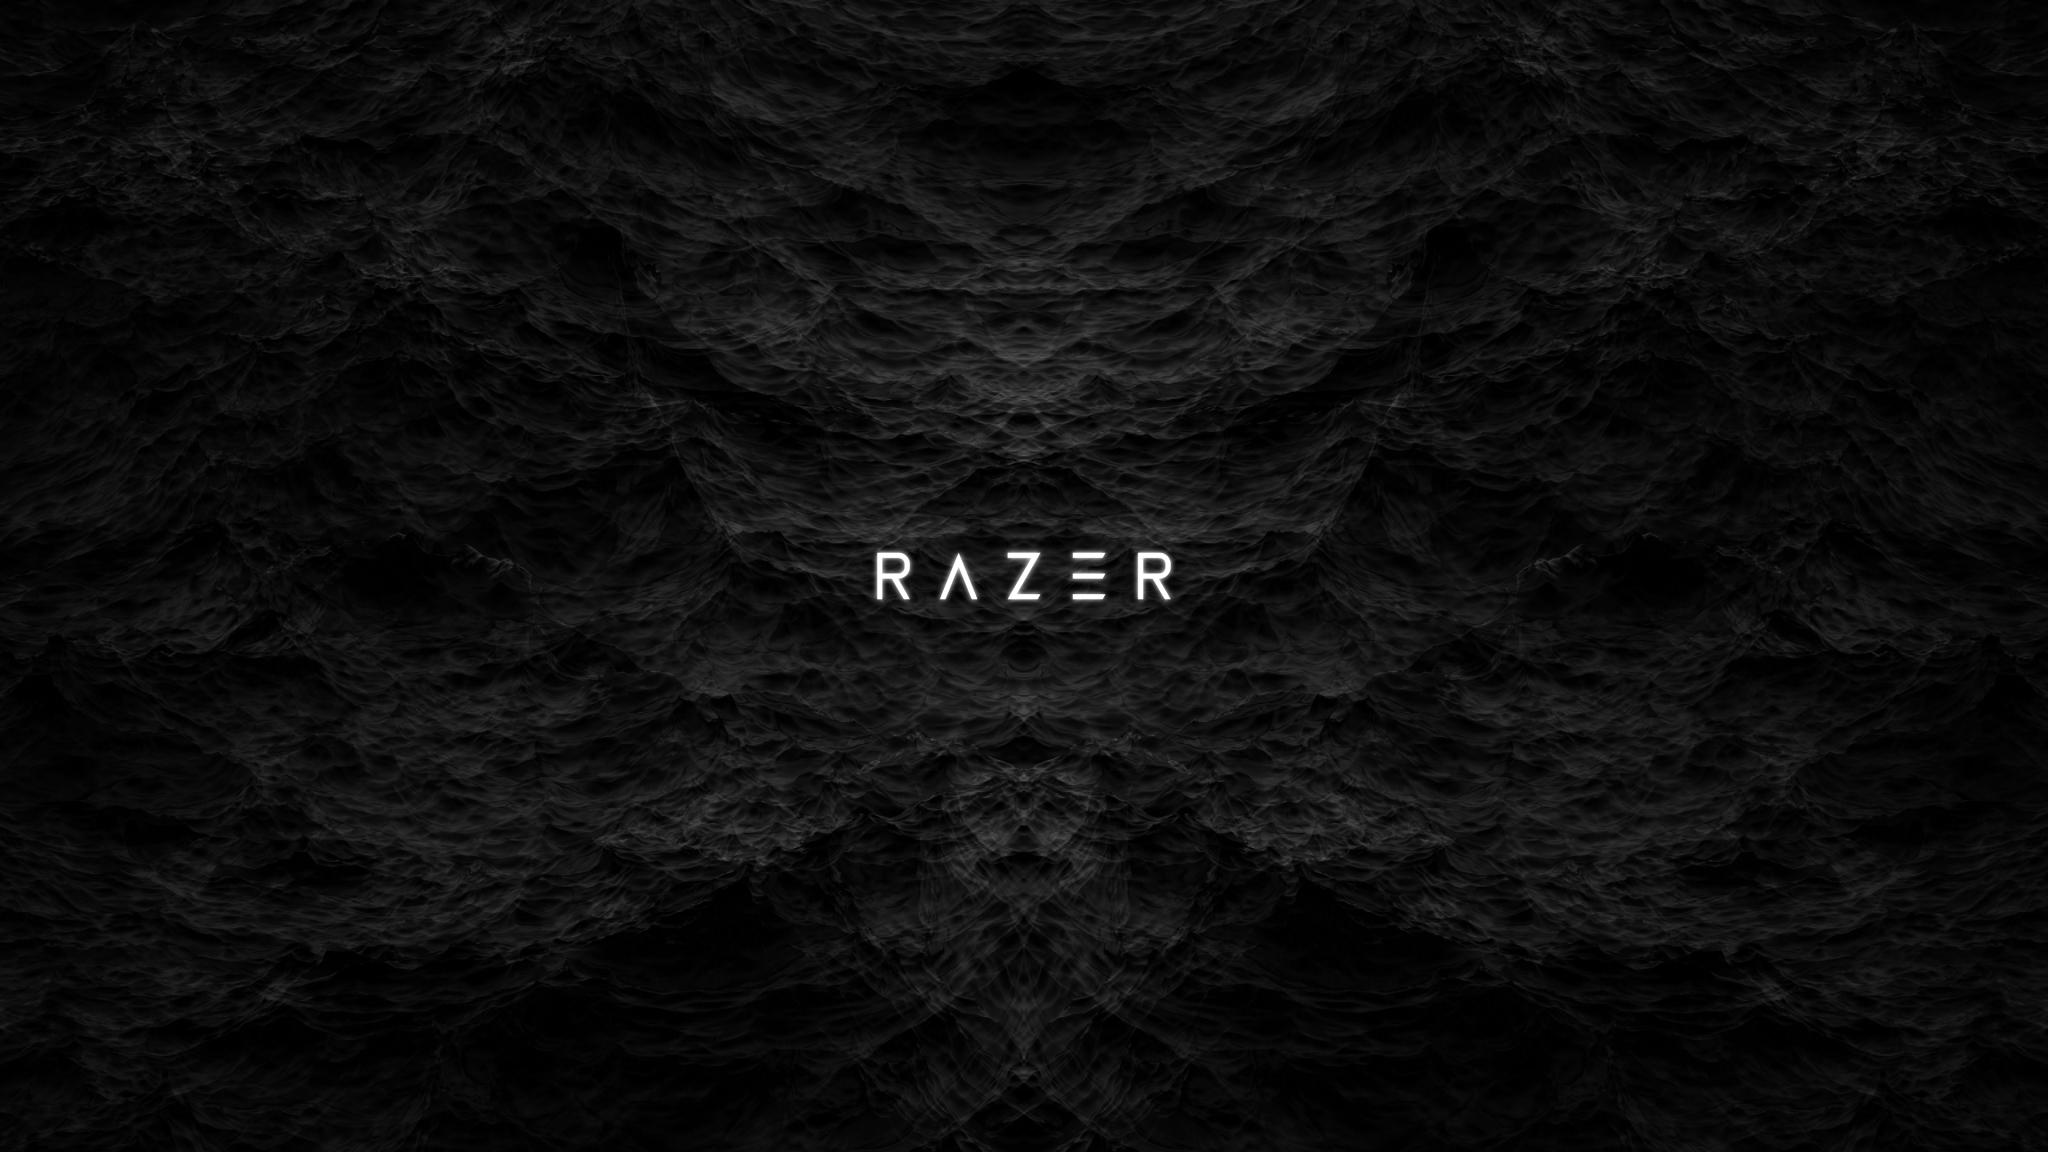 20x20 Razer 20K 20x20 Resolution Wallpaper, HD Artist 20K ...